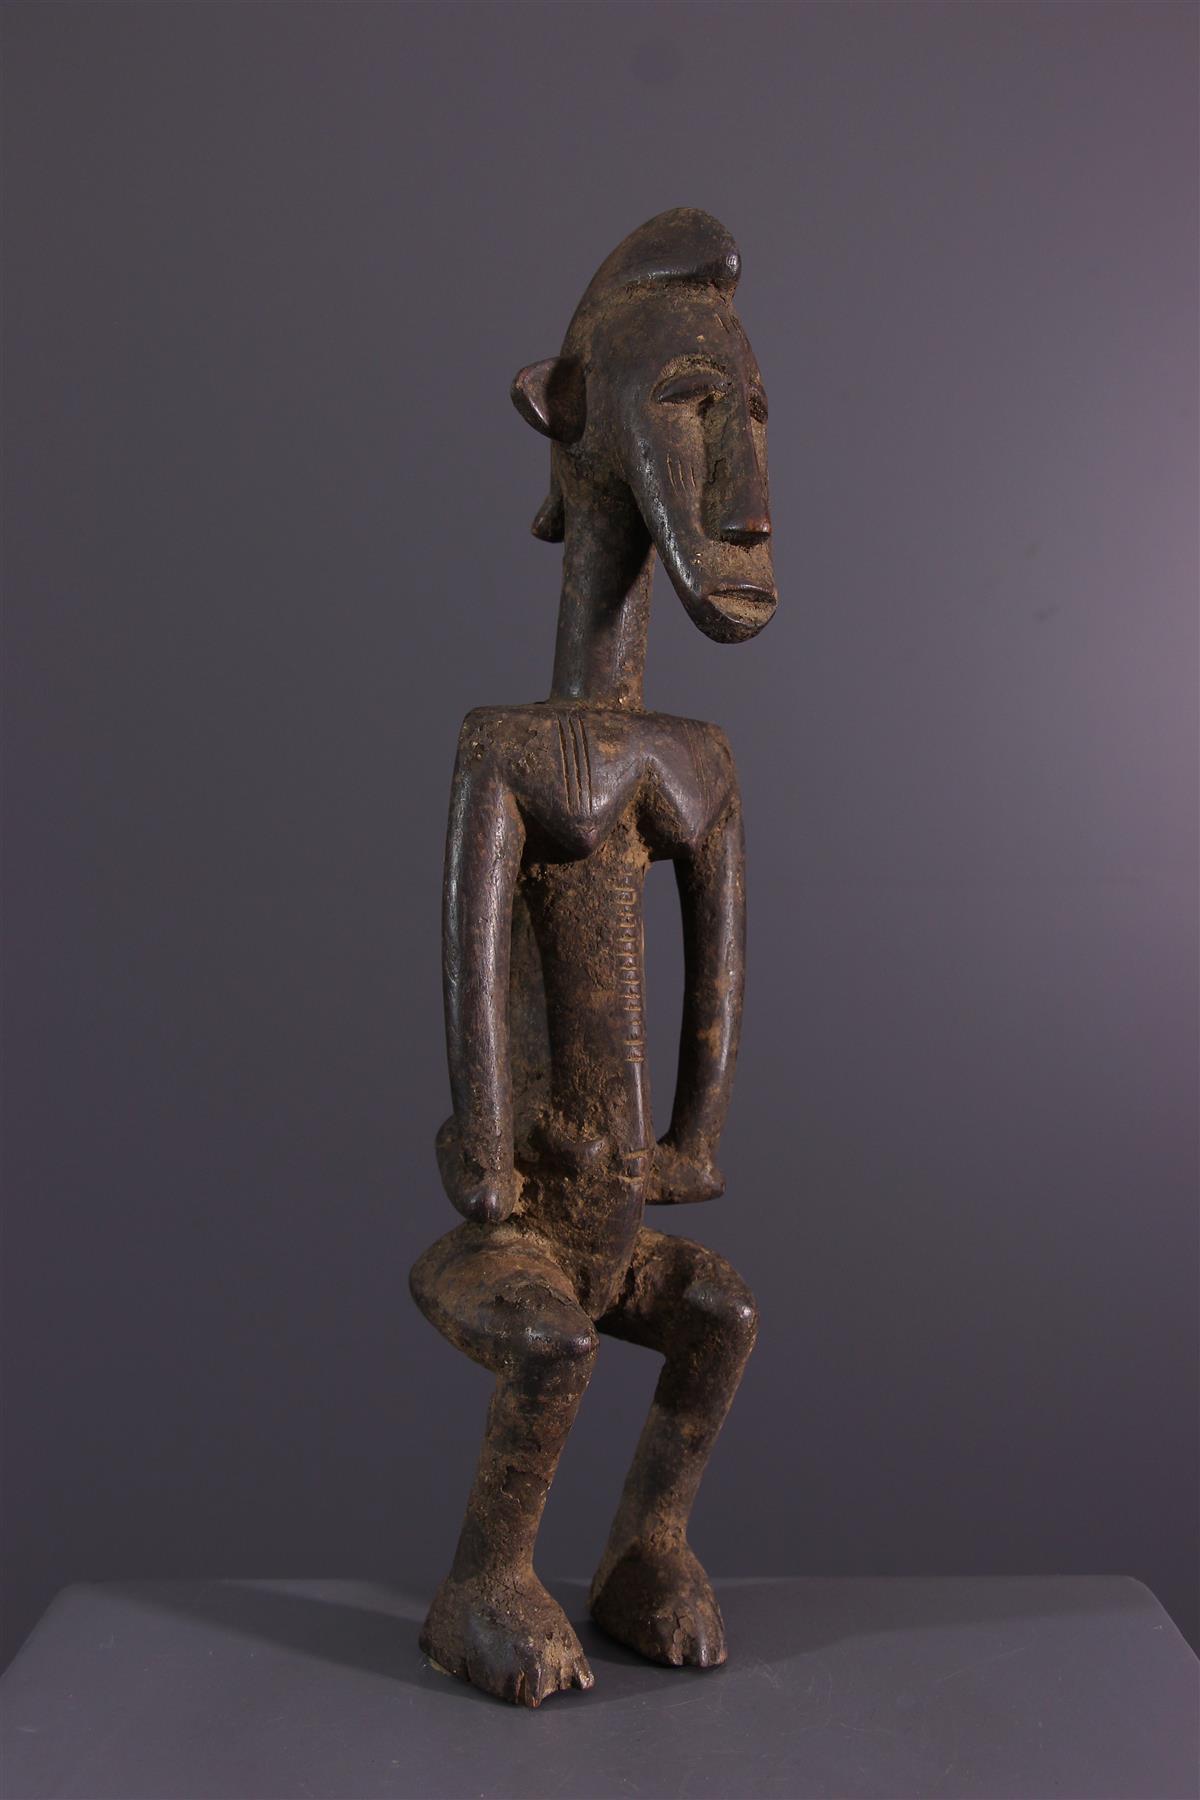 Senoufo statuette - Tribal art